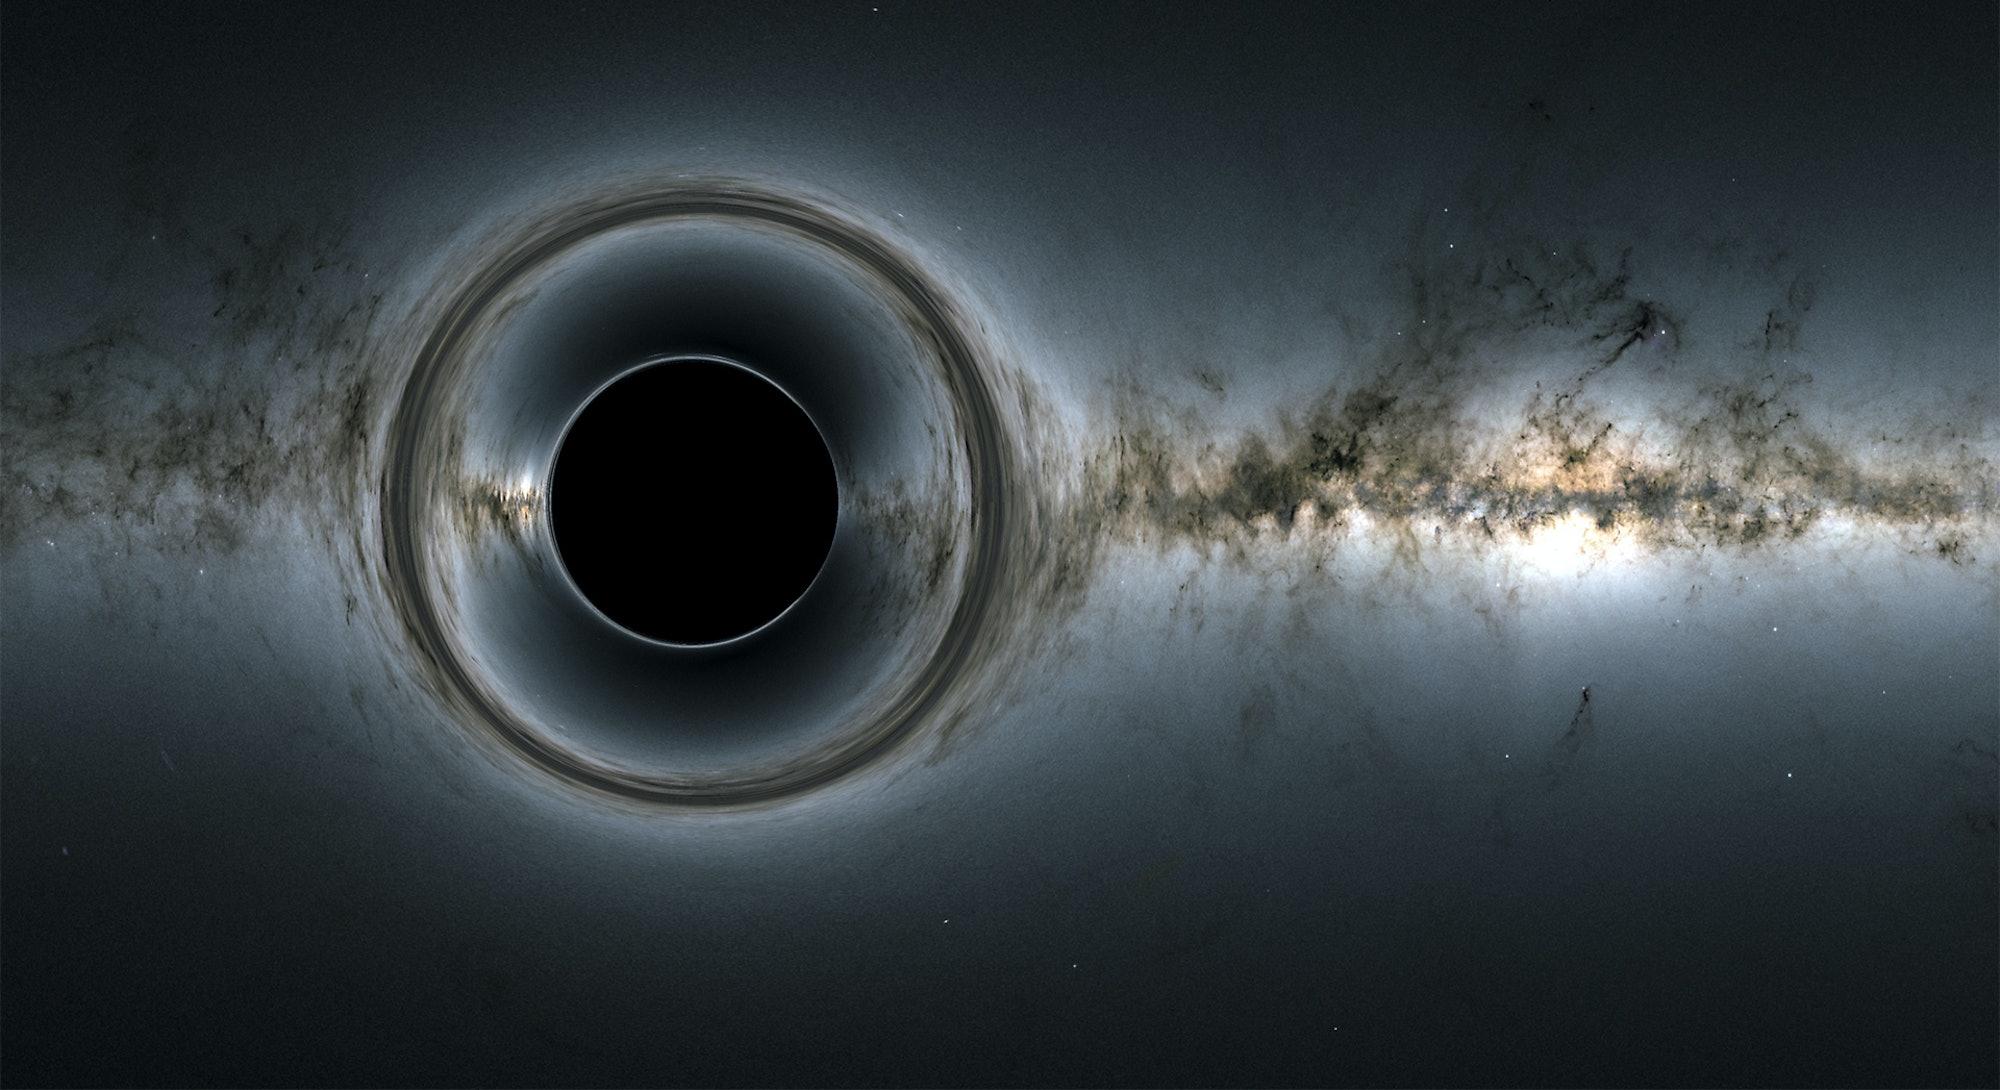 illustration of black hole distorting light